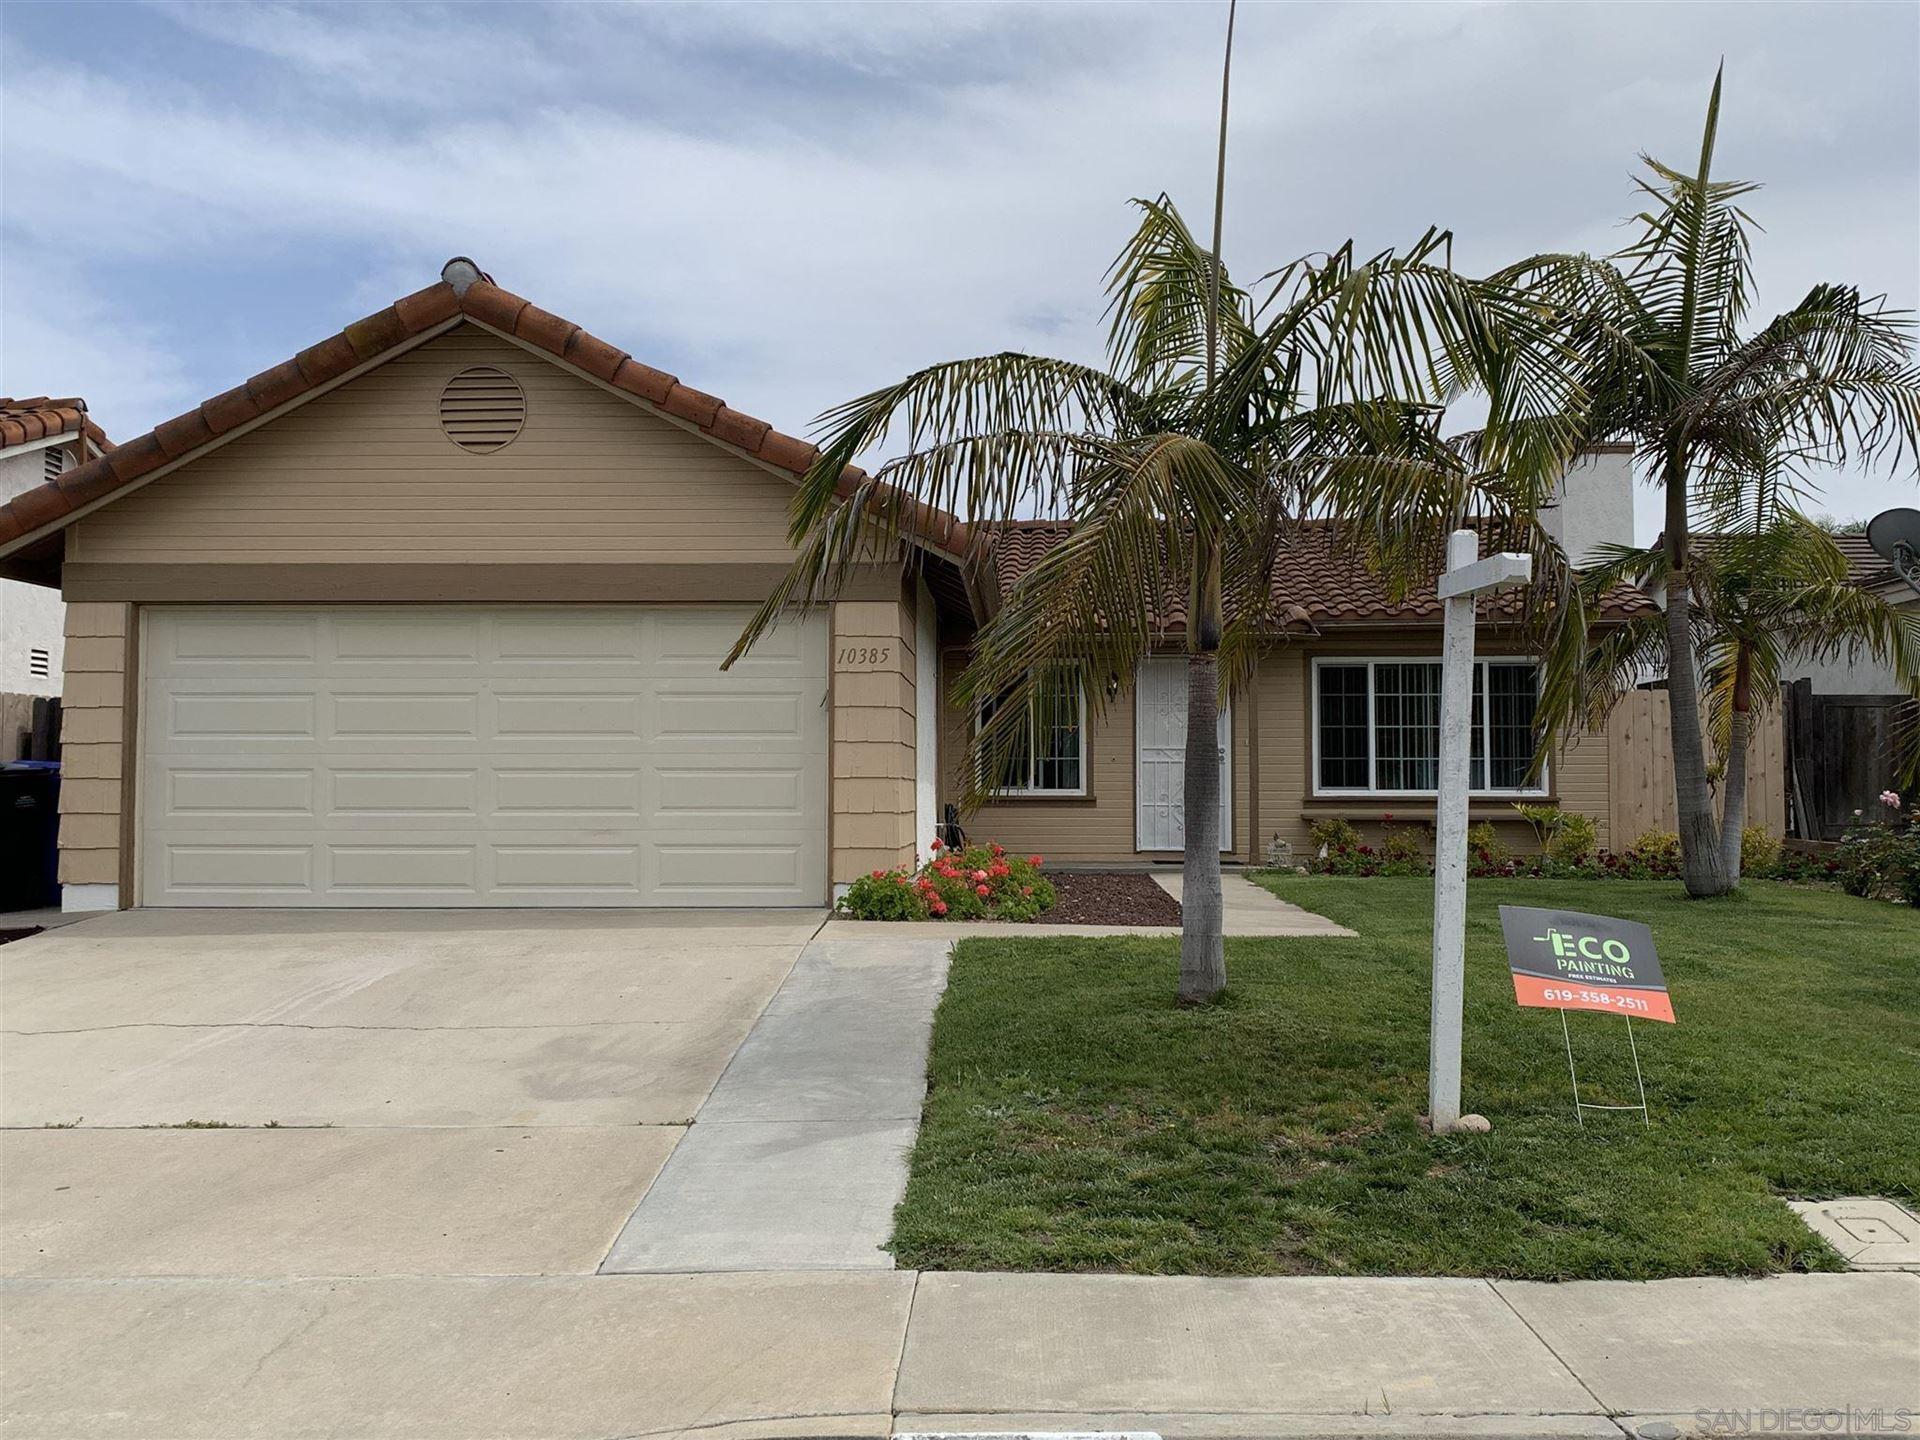 Photo of 10385 Cheviot Court, San Diego, CA 92126 (MLS # 210009587)